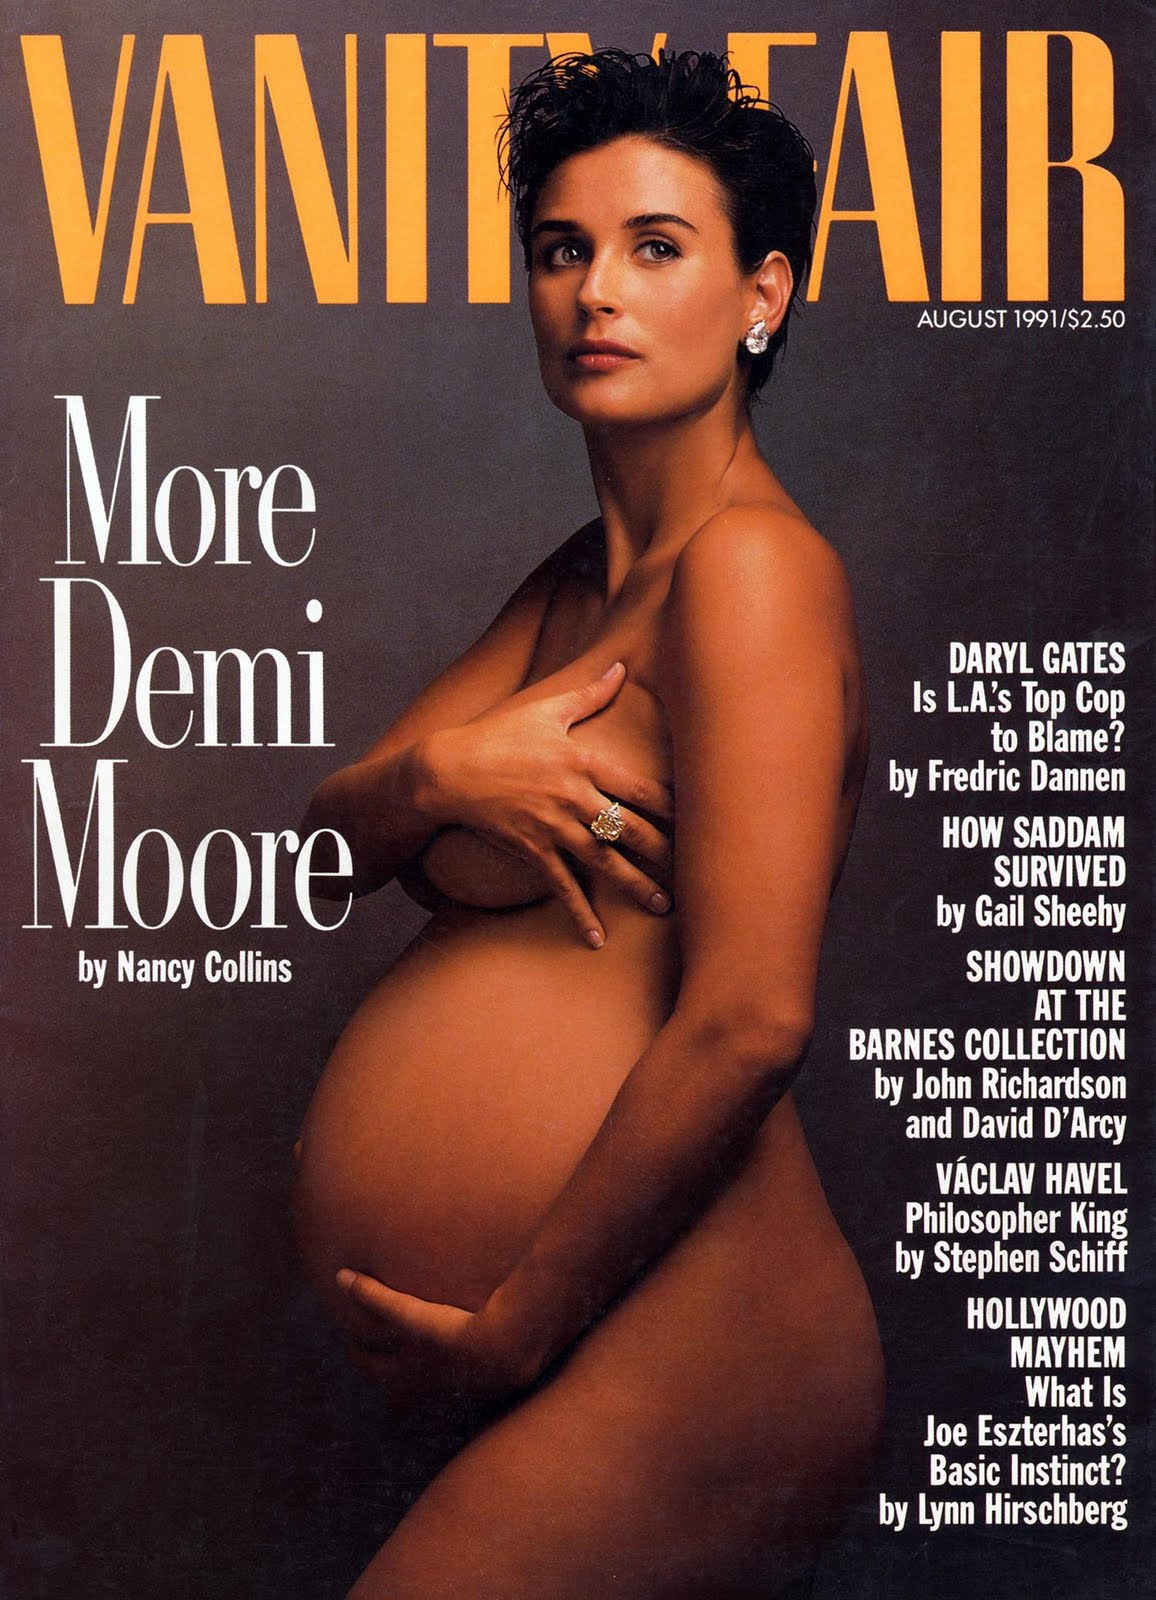 http://3.bp.blogspot.com/-V0EE-mBqJZs/Tldvt48_FxI/AAAAAAAAAlA/WNeN0LMLFSk/s1600/annie-leibovitz-more-demi-moore-nude-pregnant-vanity-fair-august-1991-cover-portrait.jpg